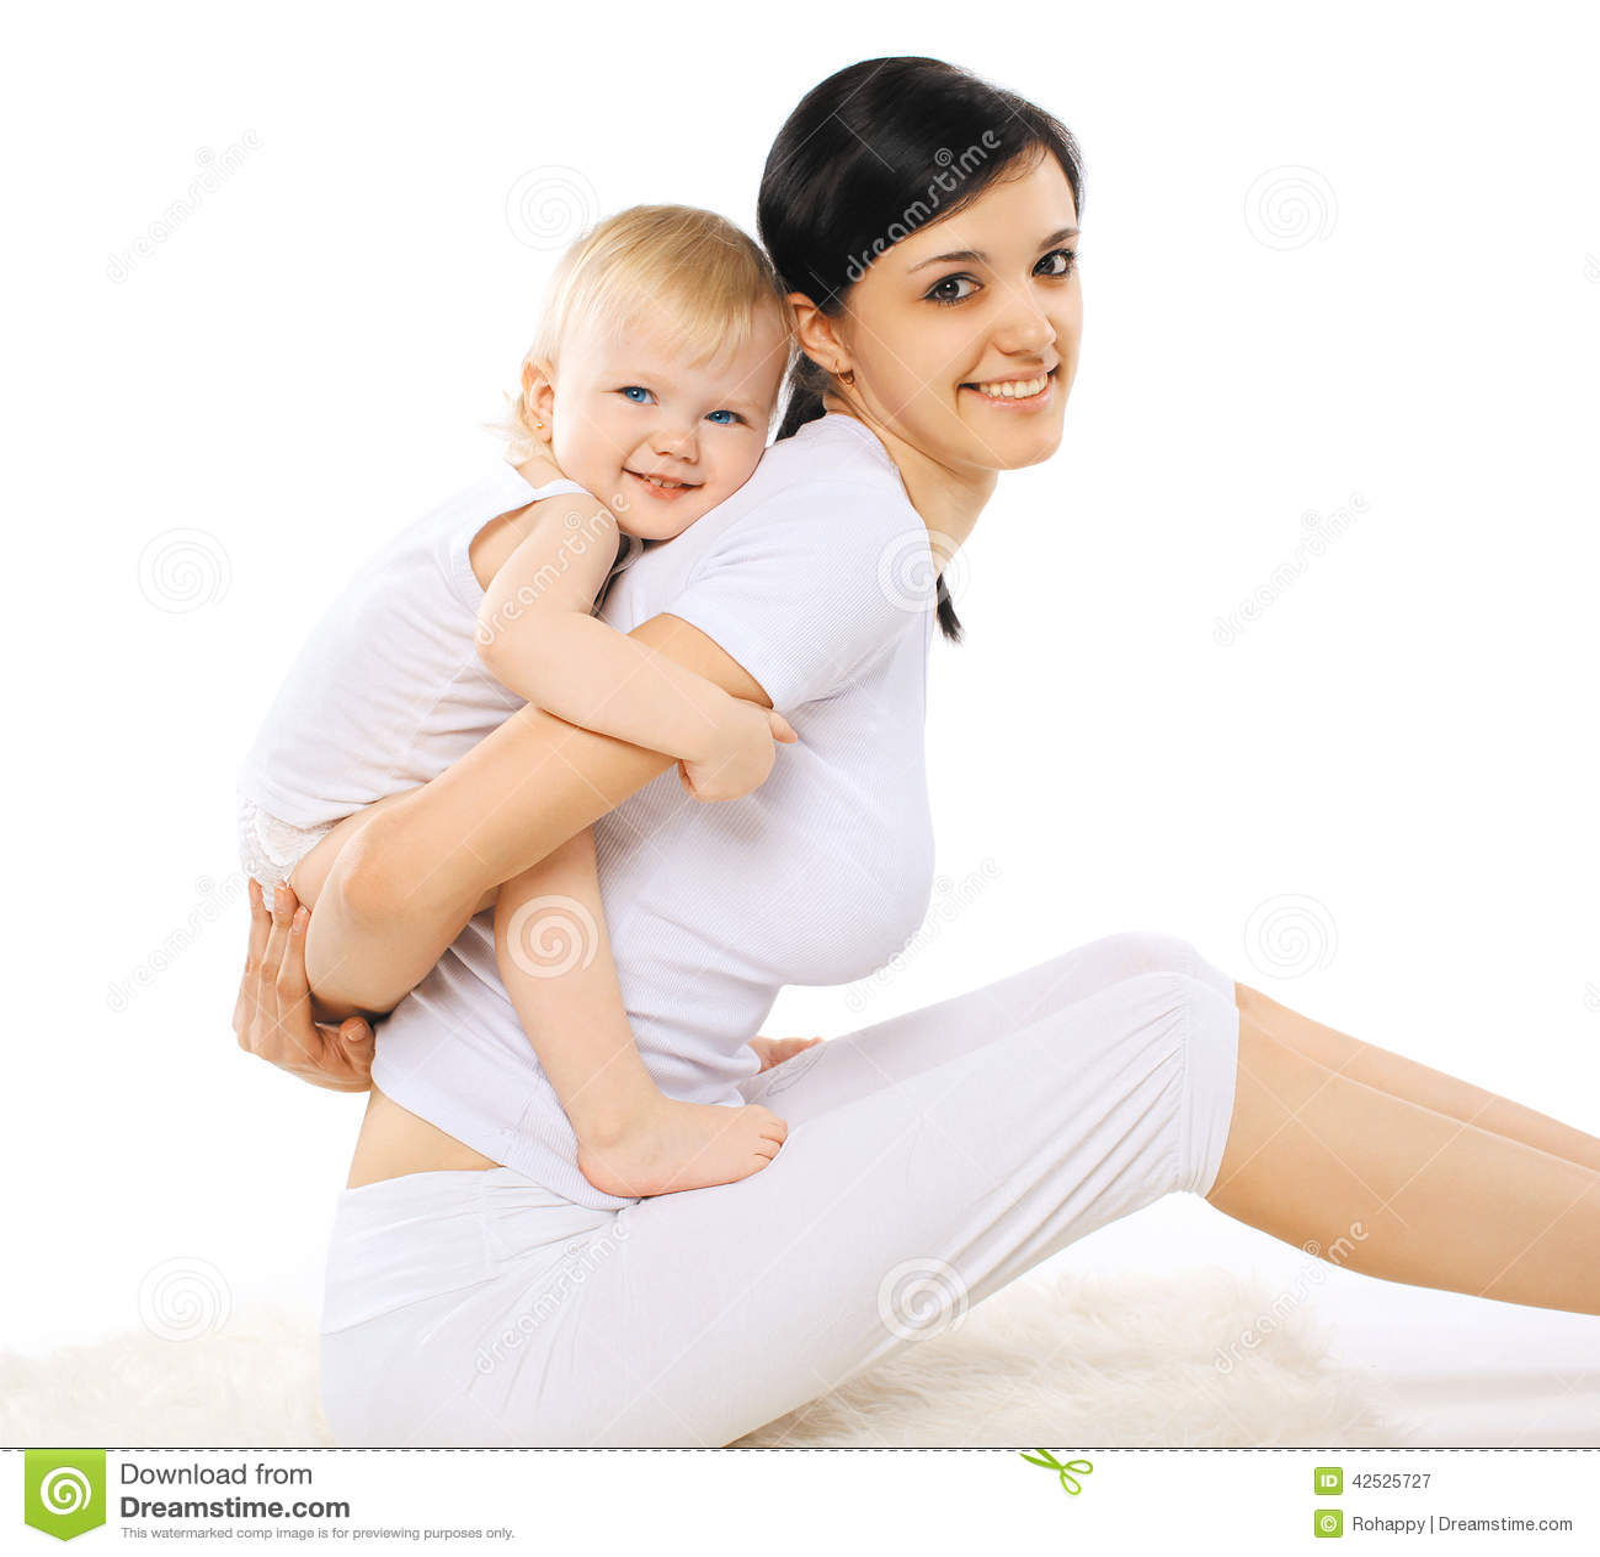 ... home gymnastics yoga fitness and health concept mr yes pr no 2 257 2